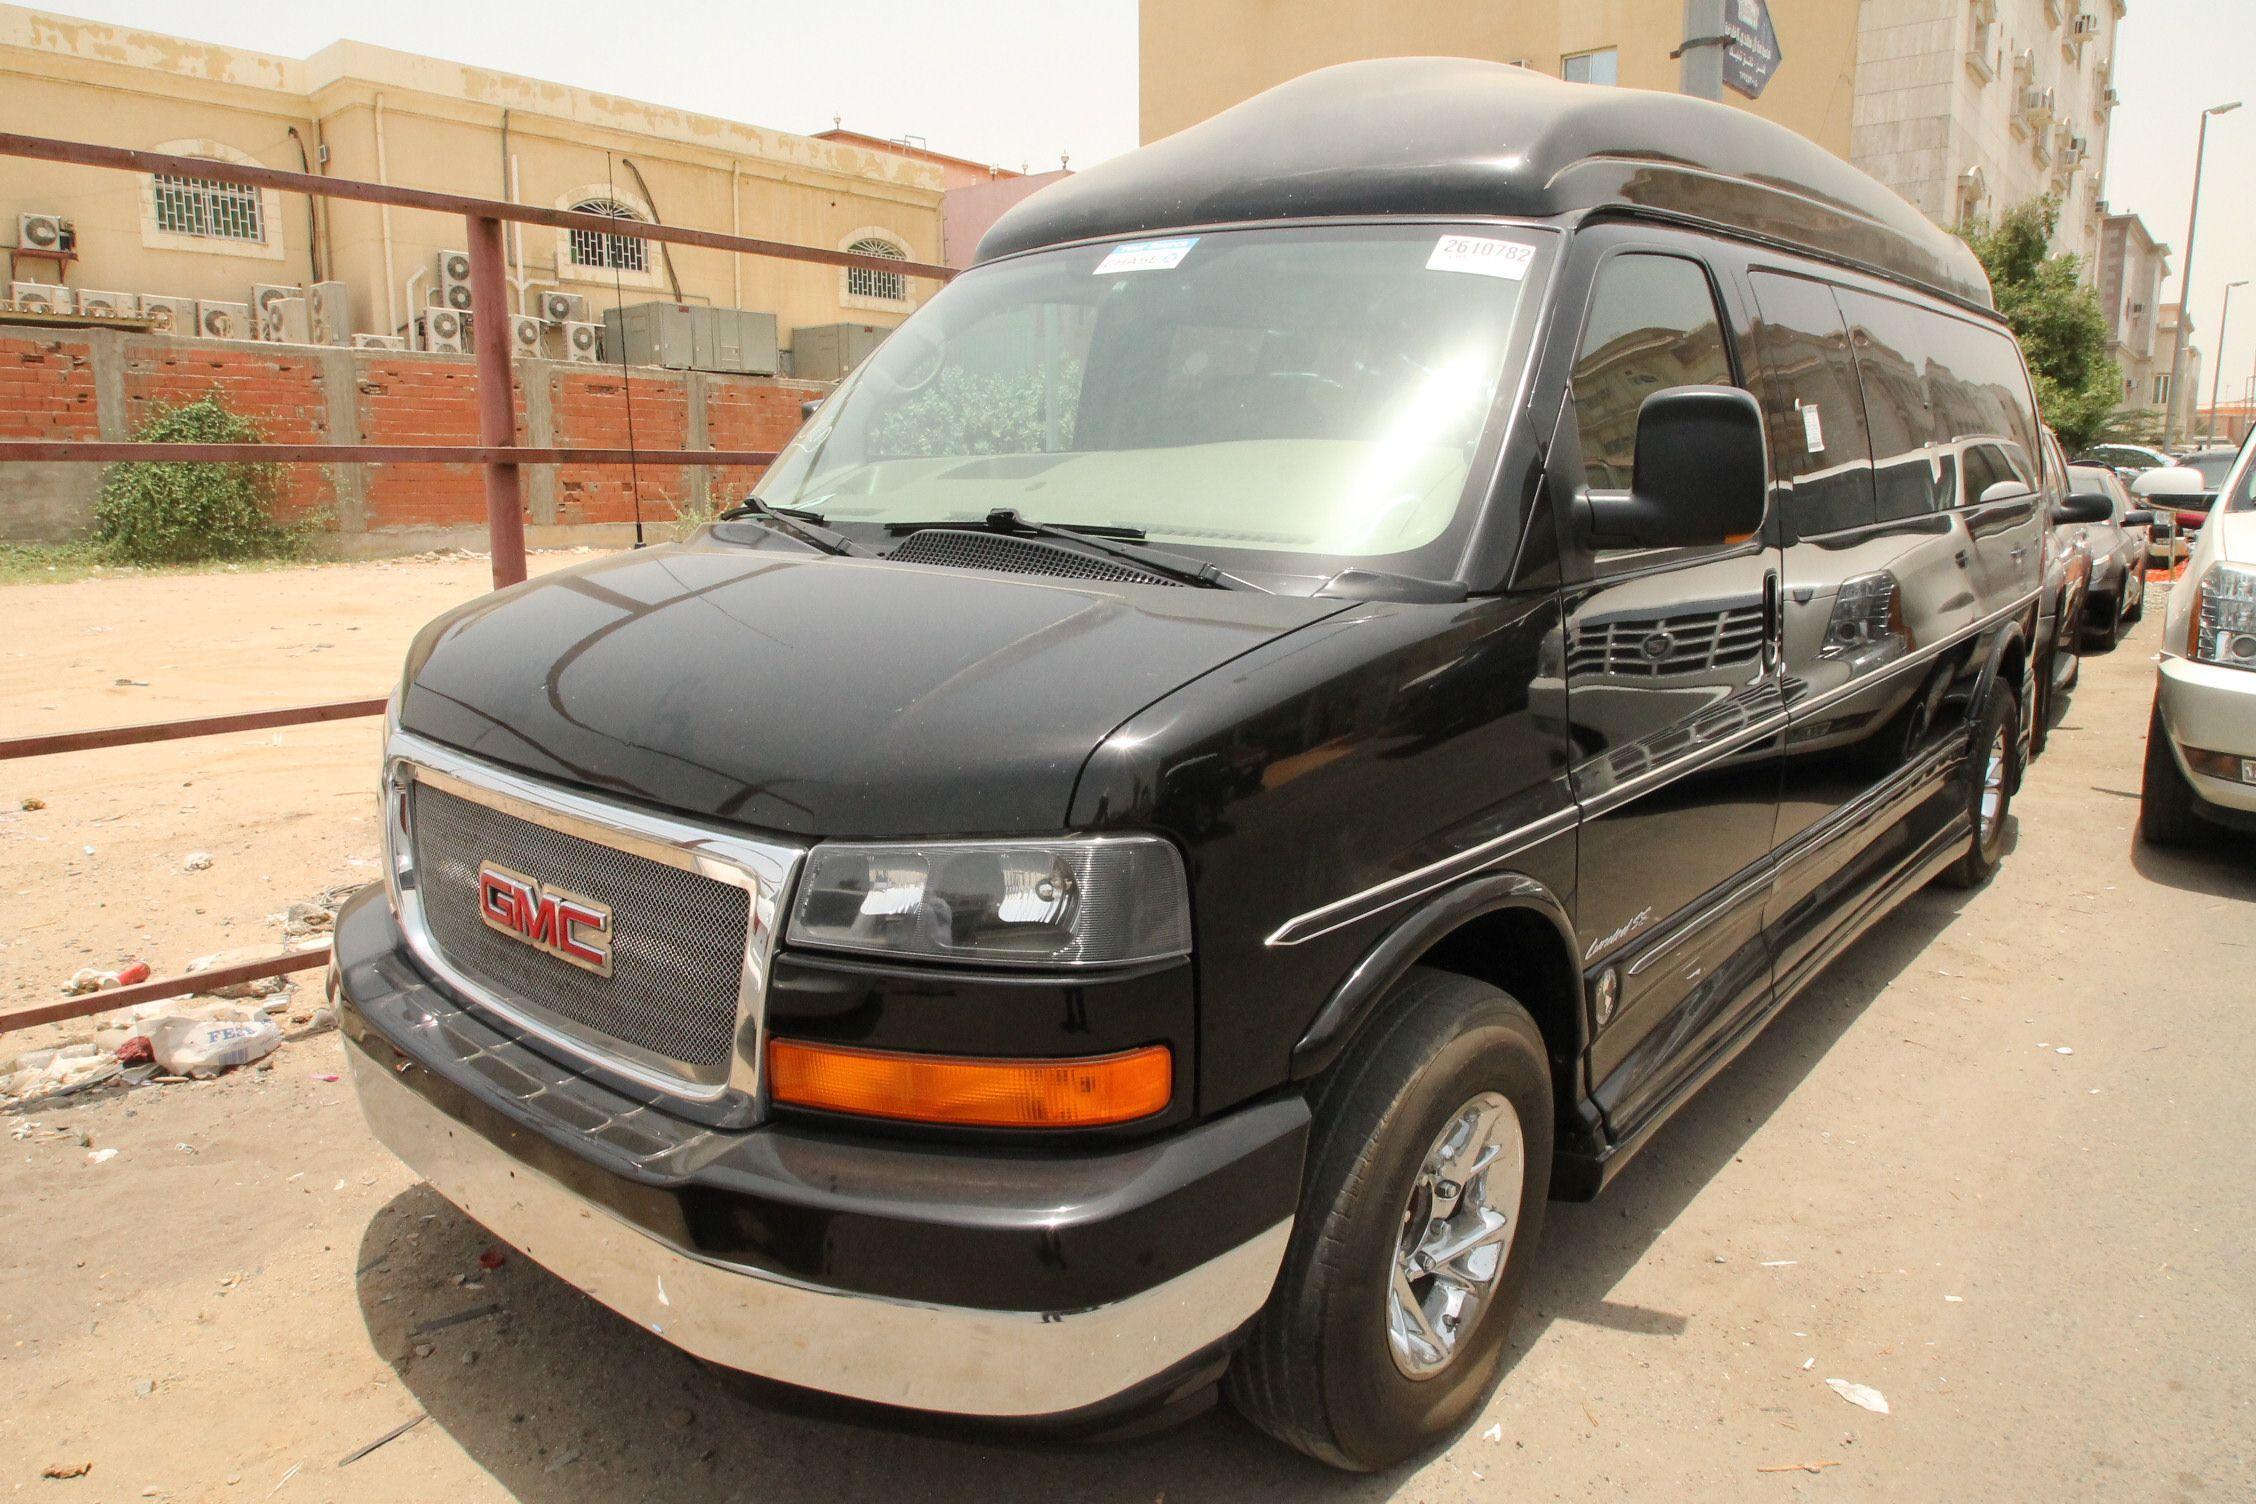 Gmc savana for sale in jeddah awesome vehicles pinterest jeddah and cars